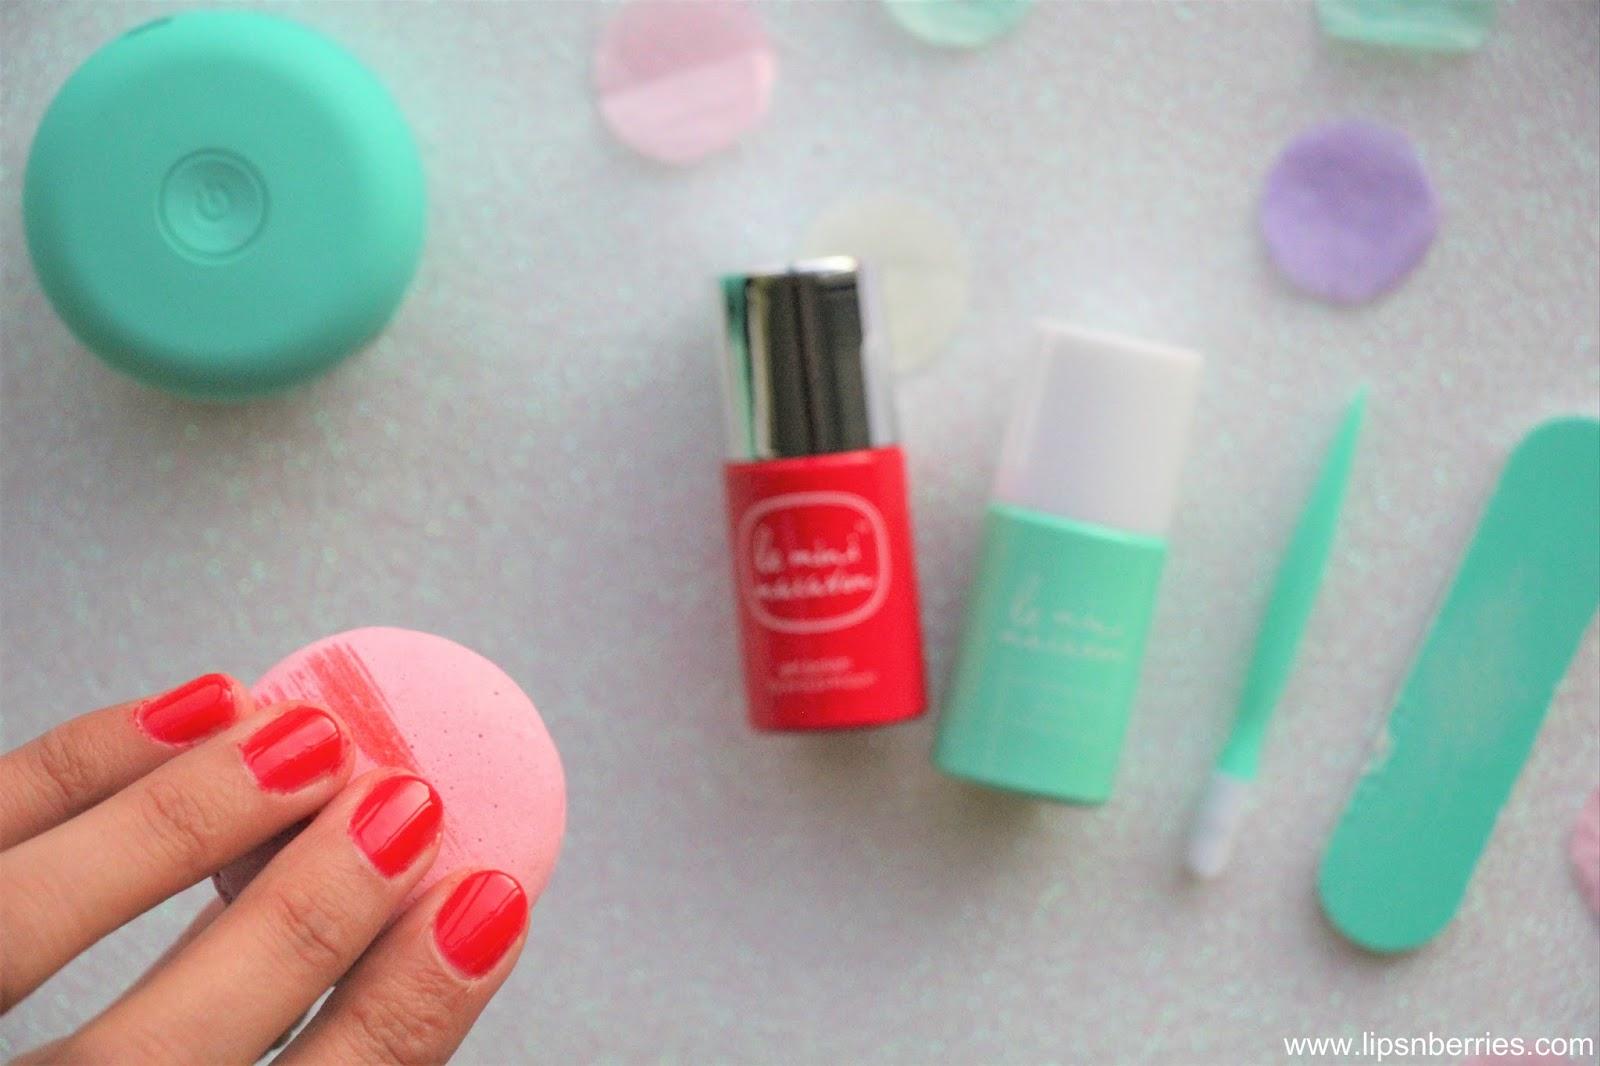 Lips n Berries!: Le Mini Macaron Gel Nail Manicure Kit Review